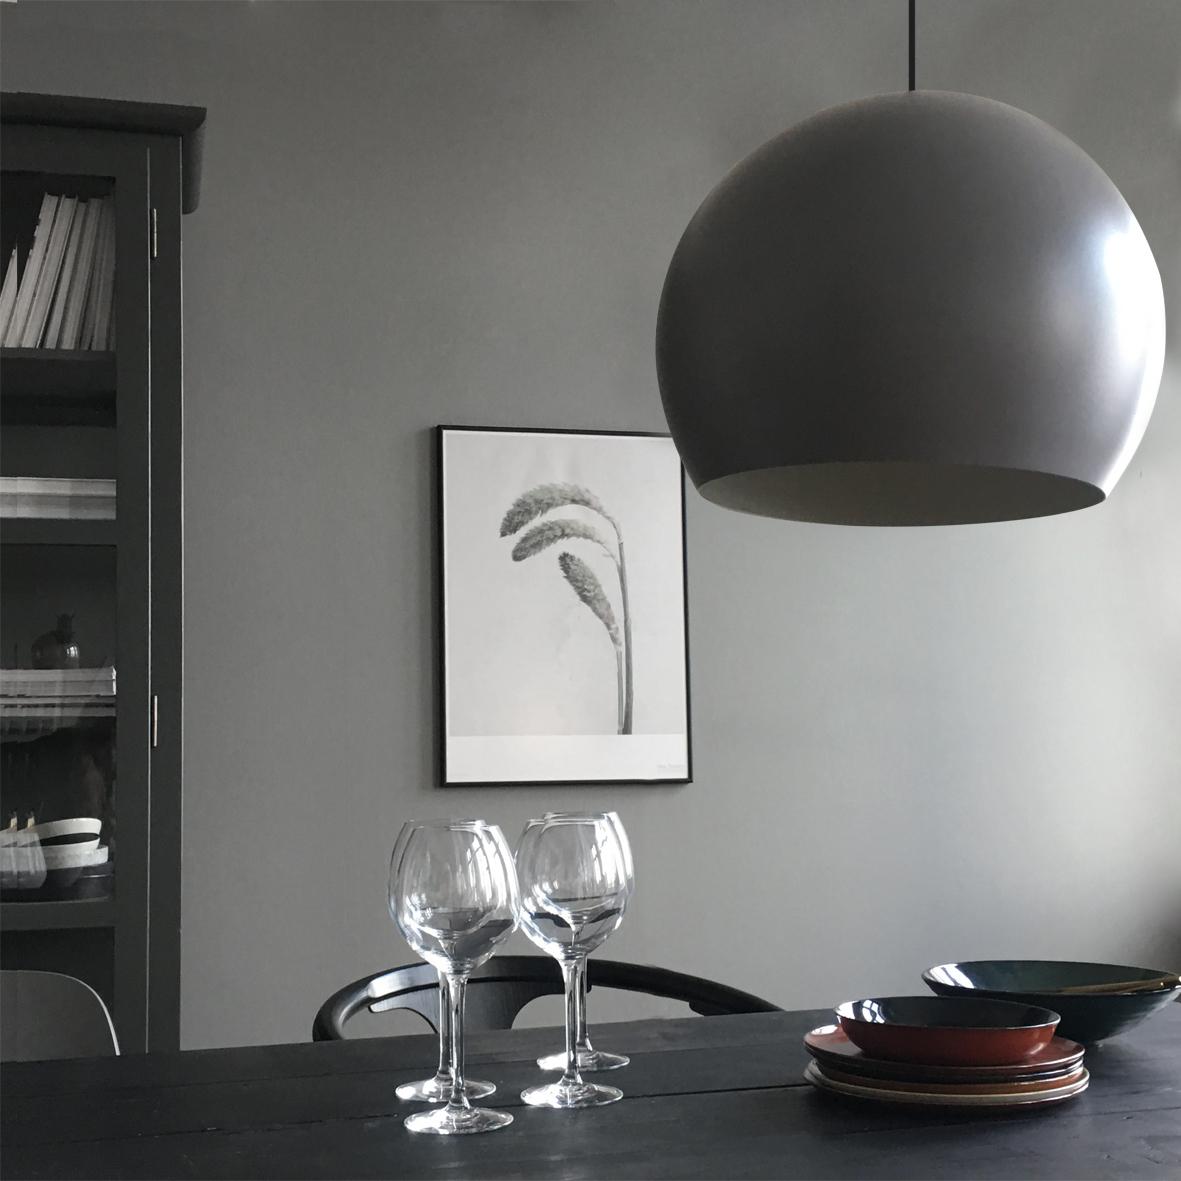 Ball pendant 40 cm aluminium grey matt - lifestyle HM Marts_3 1530.jpg